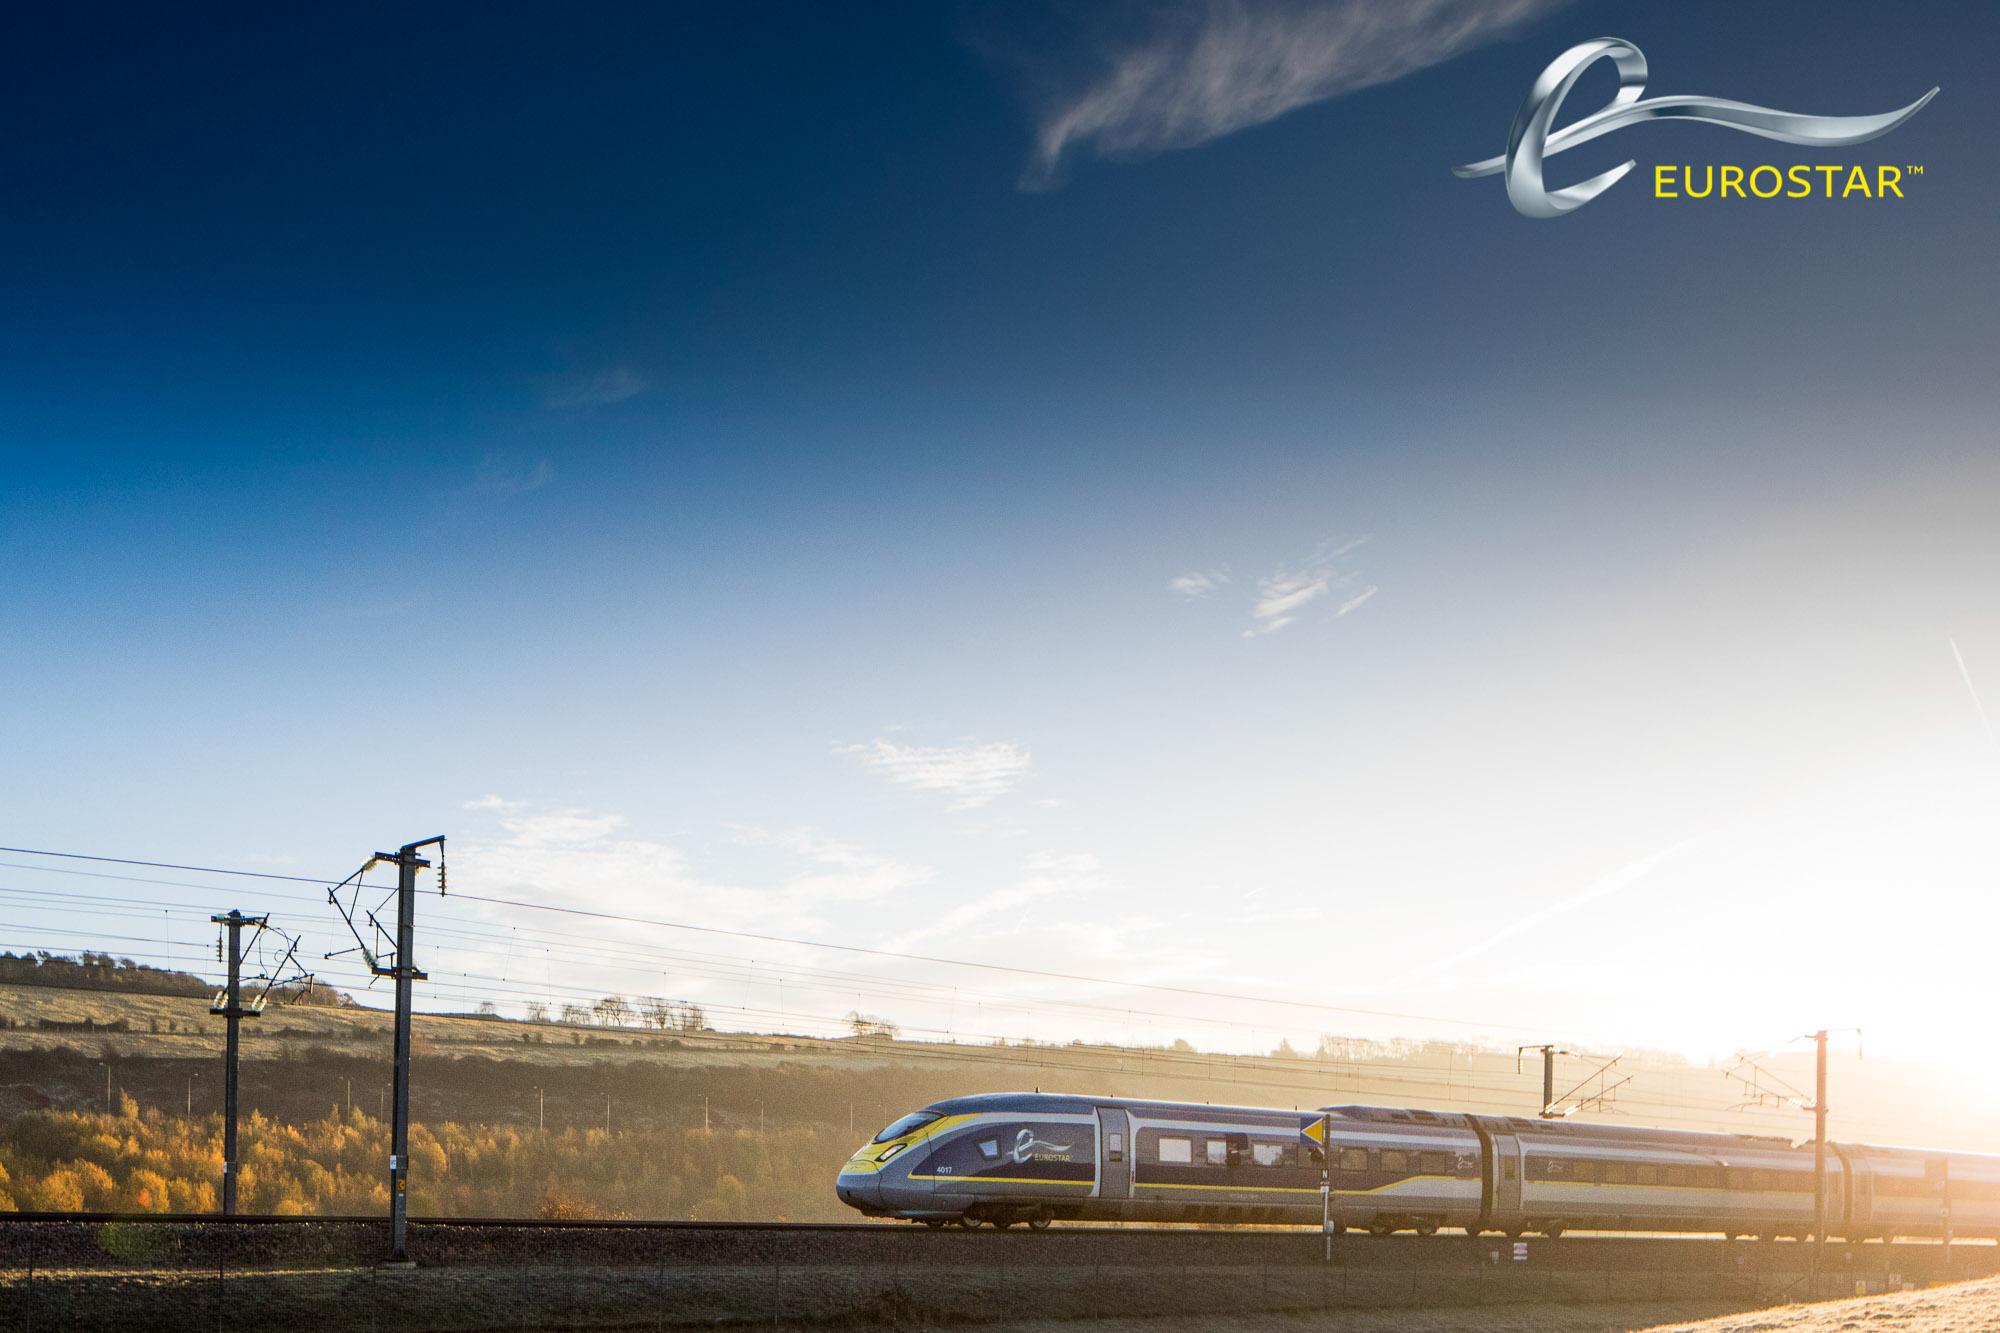 171117_Eurostar_Verbatim_086_R (1).jpg